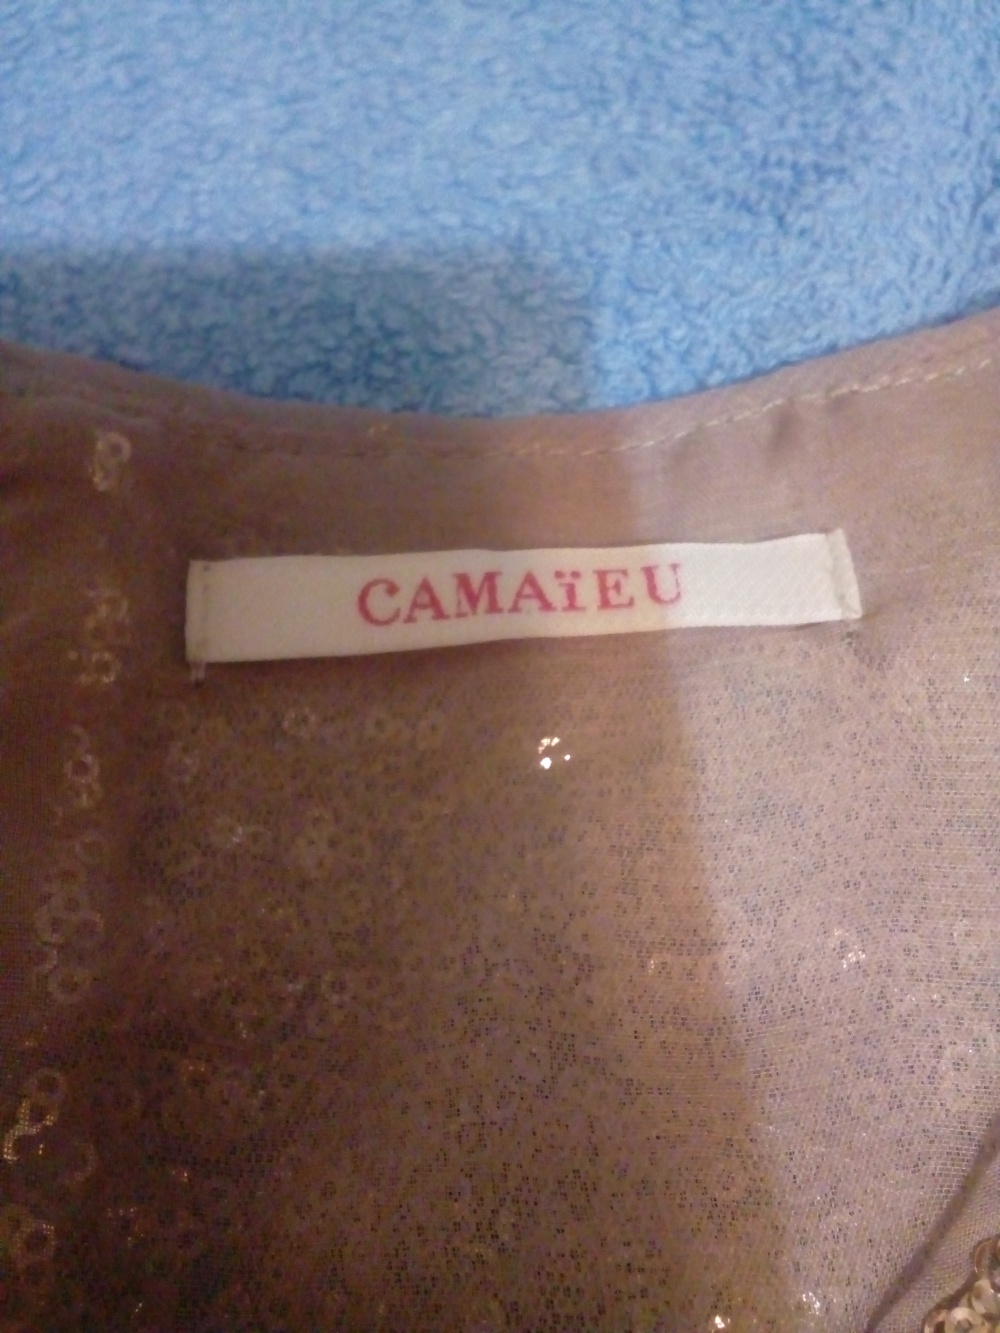 Блузка-топ. Camaieu. Р-р 44-46